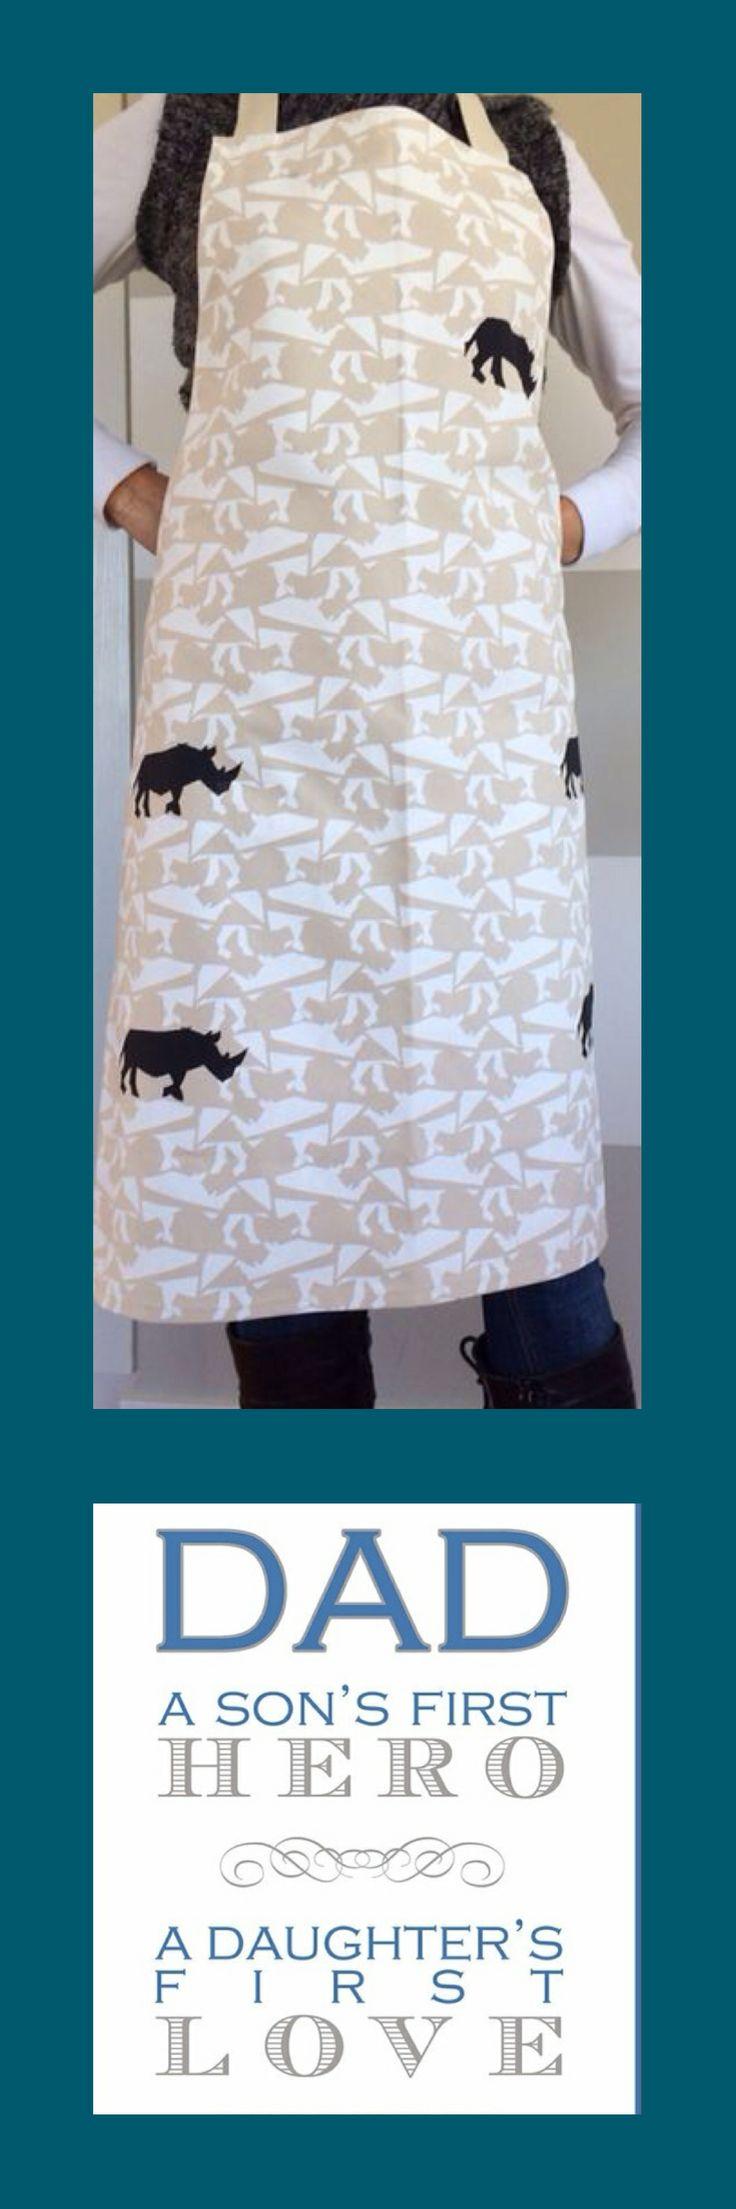 Fathers Day Aprons available @ eCo, 196 Main Rd, Walmer, Port Elizabeth, South Africa - SuzieQu Bespoke Rhino print